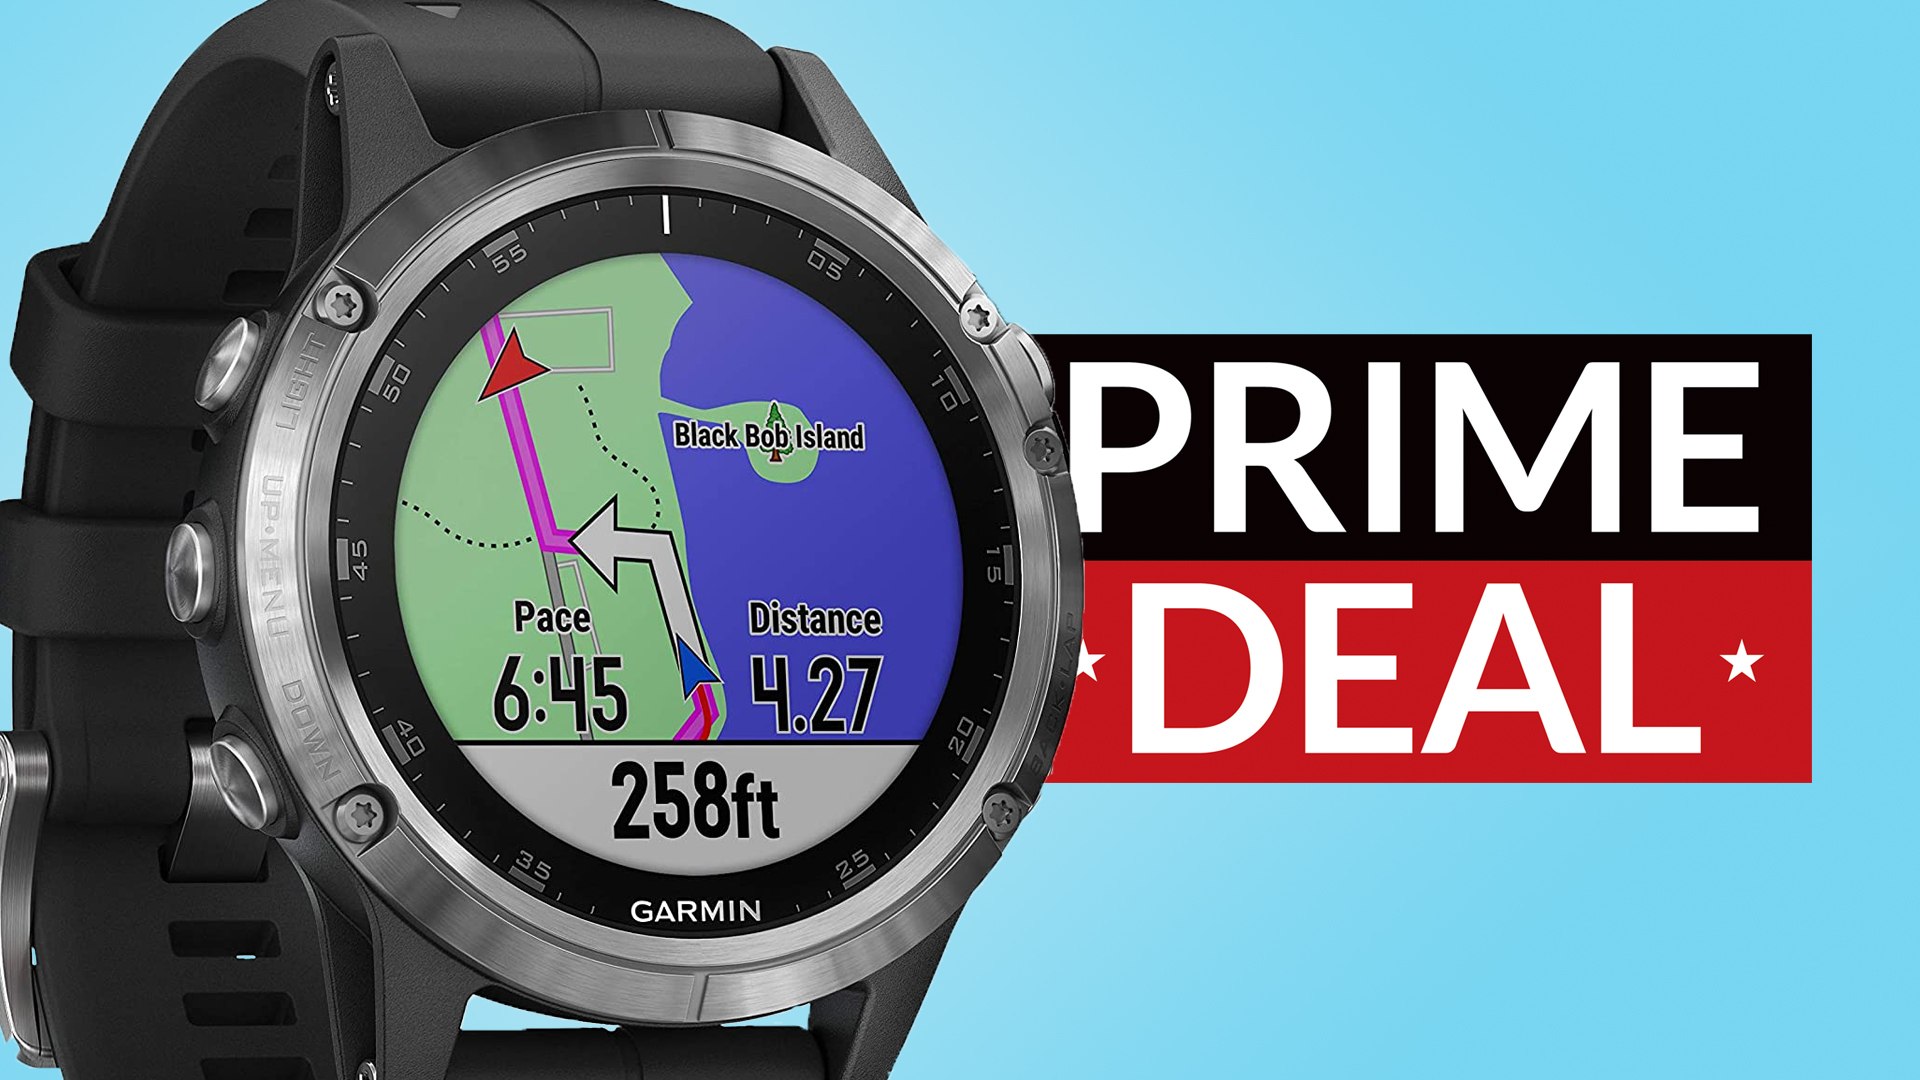 Amazon Prime Day Garmin Deal Fenix 5 Plus Receives Juicy Price Cut For Amazon Prime Day Save Today T3